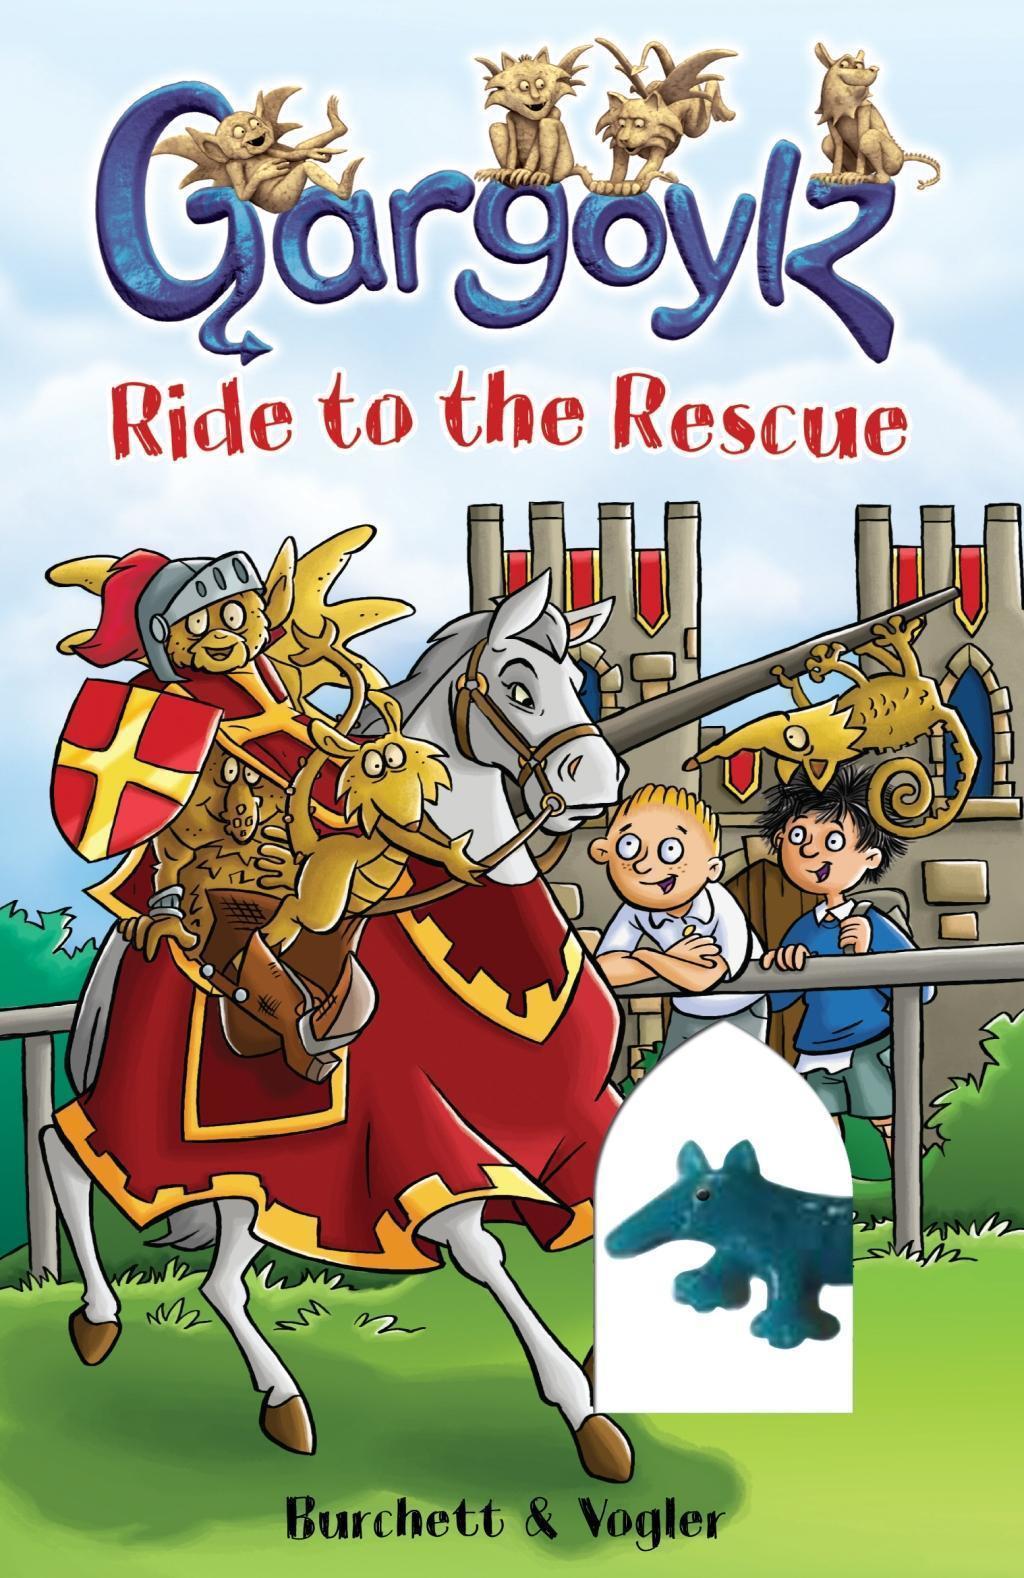 Gargoylz Ride to the Rescue